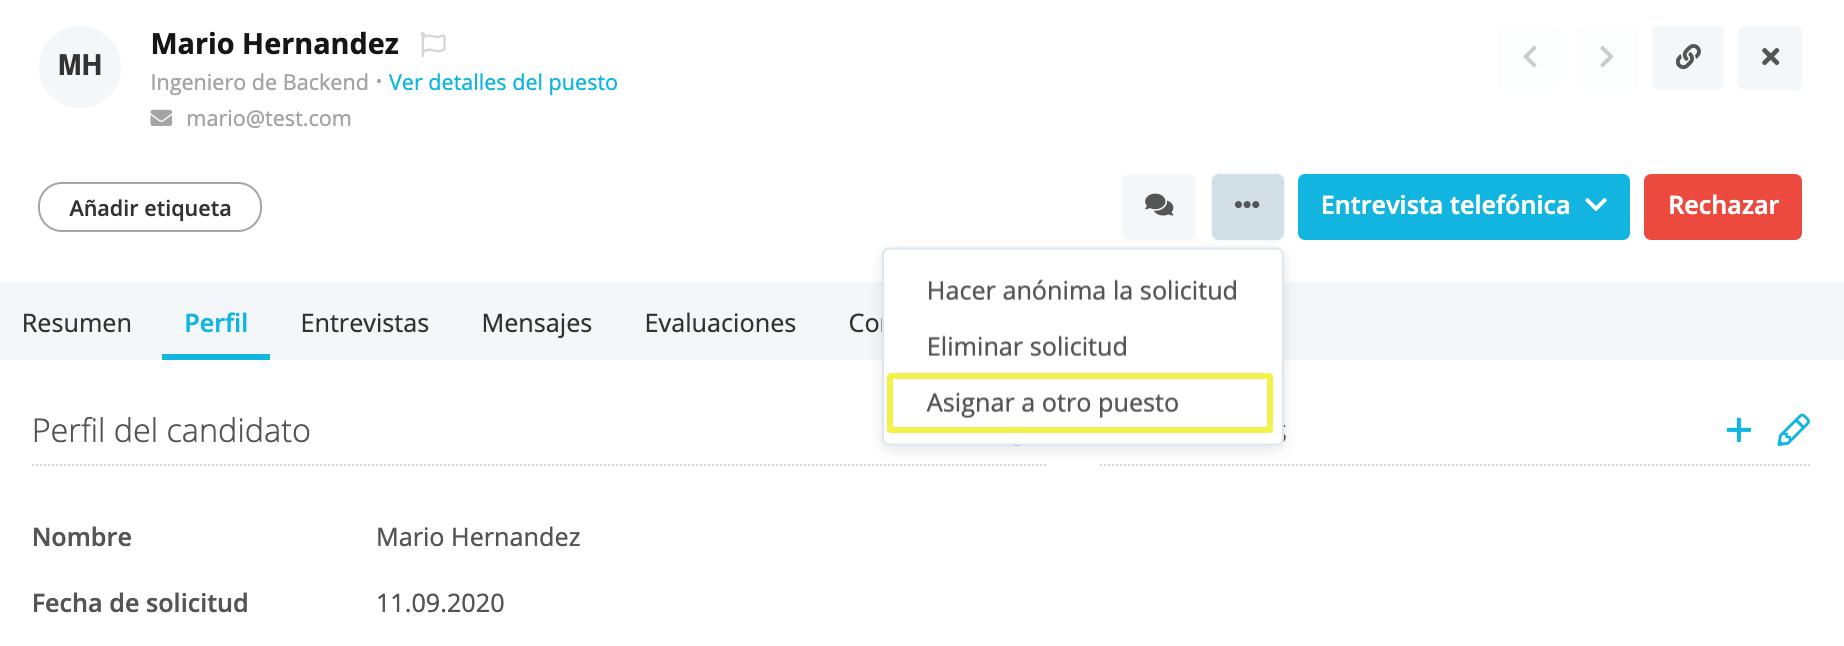 recruiting-applicantprofile-assigntoanotherposition_es.png